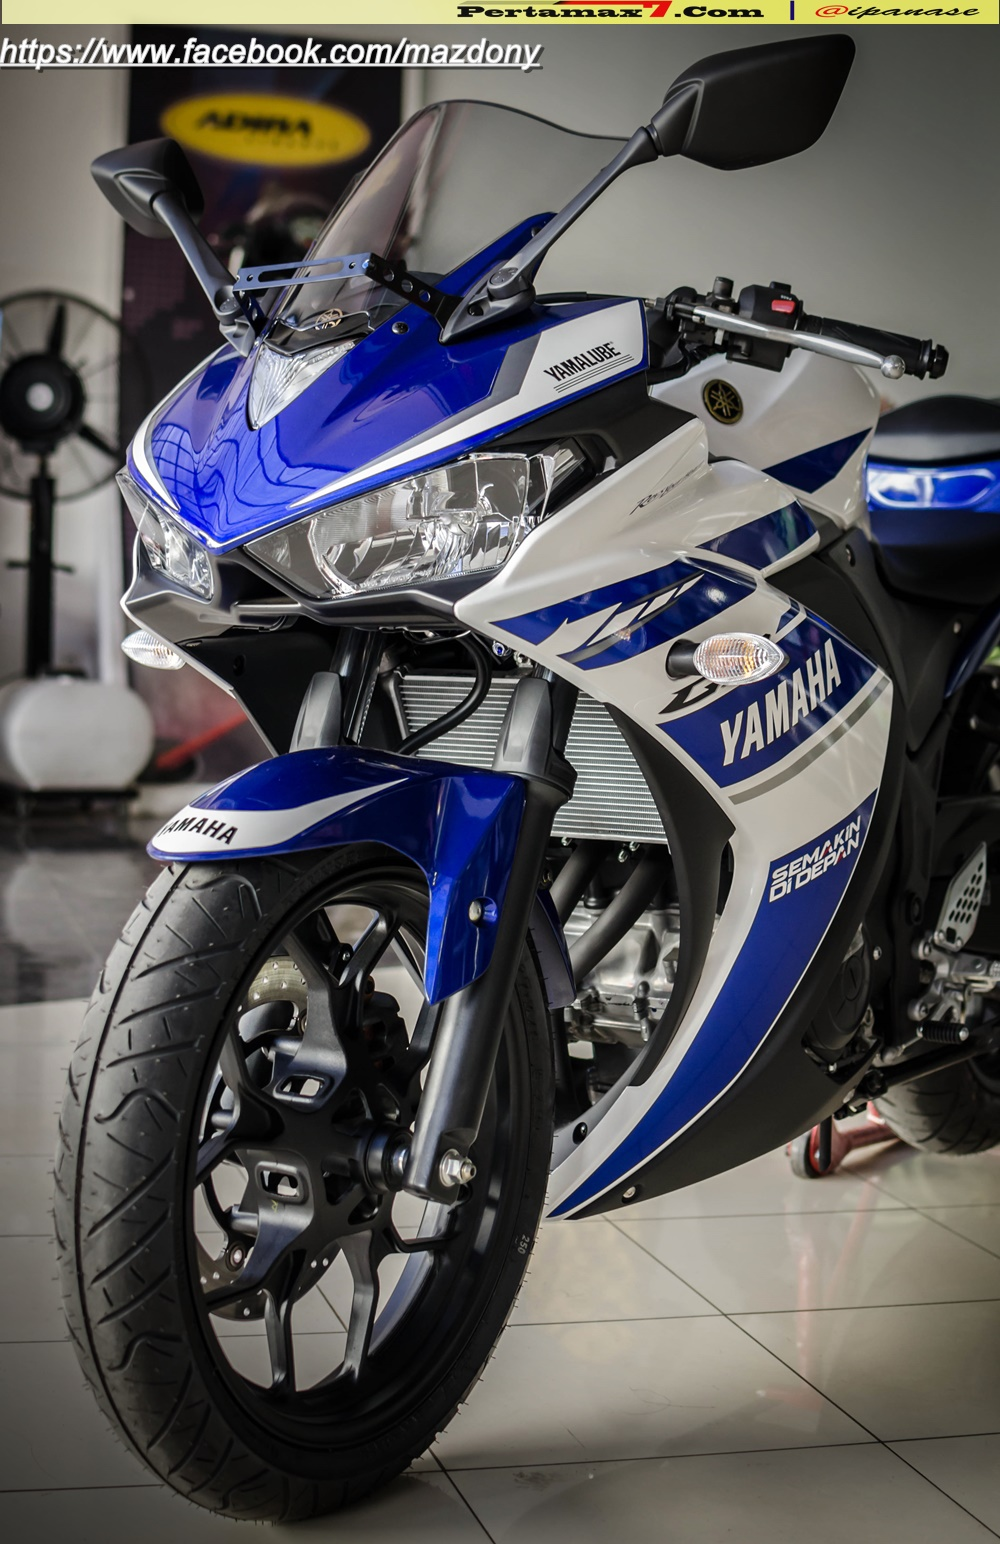 Yamaha YZF-R25 Blue pertamax7.com Indonesia 34